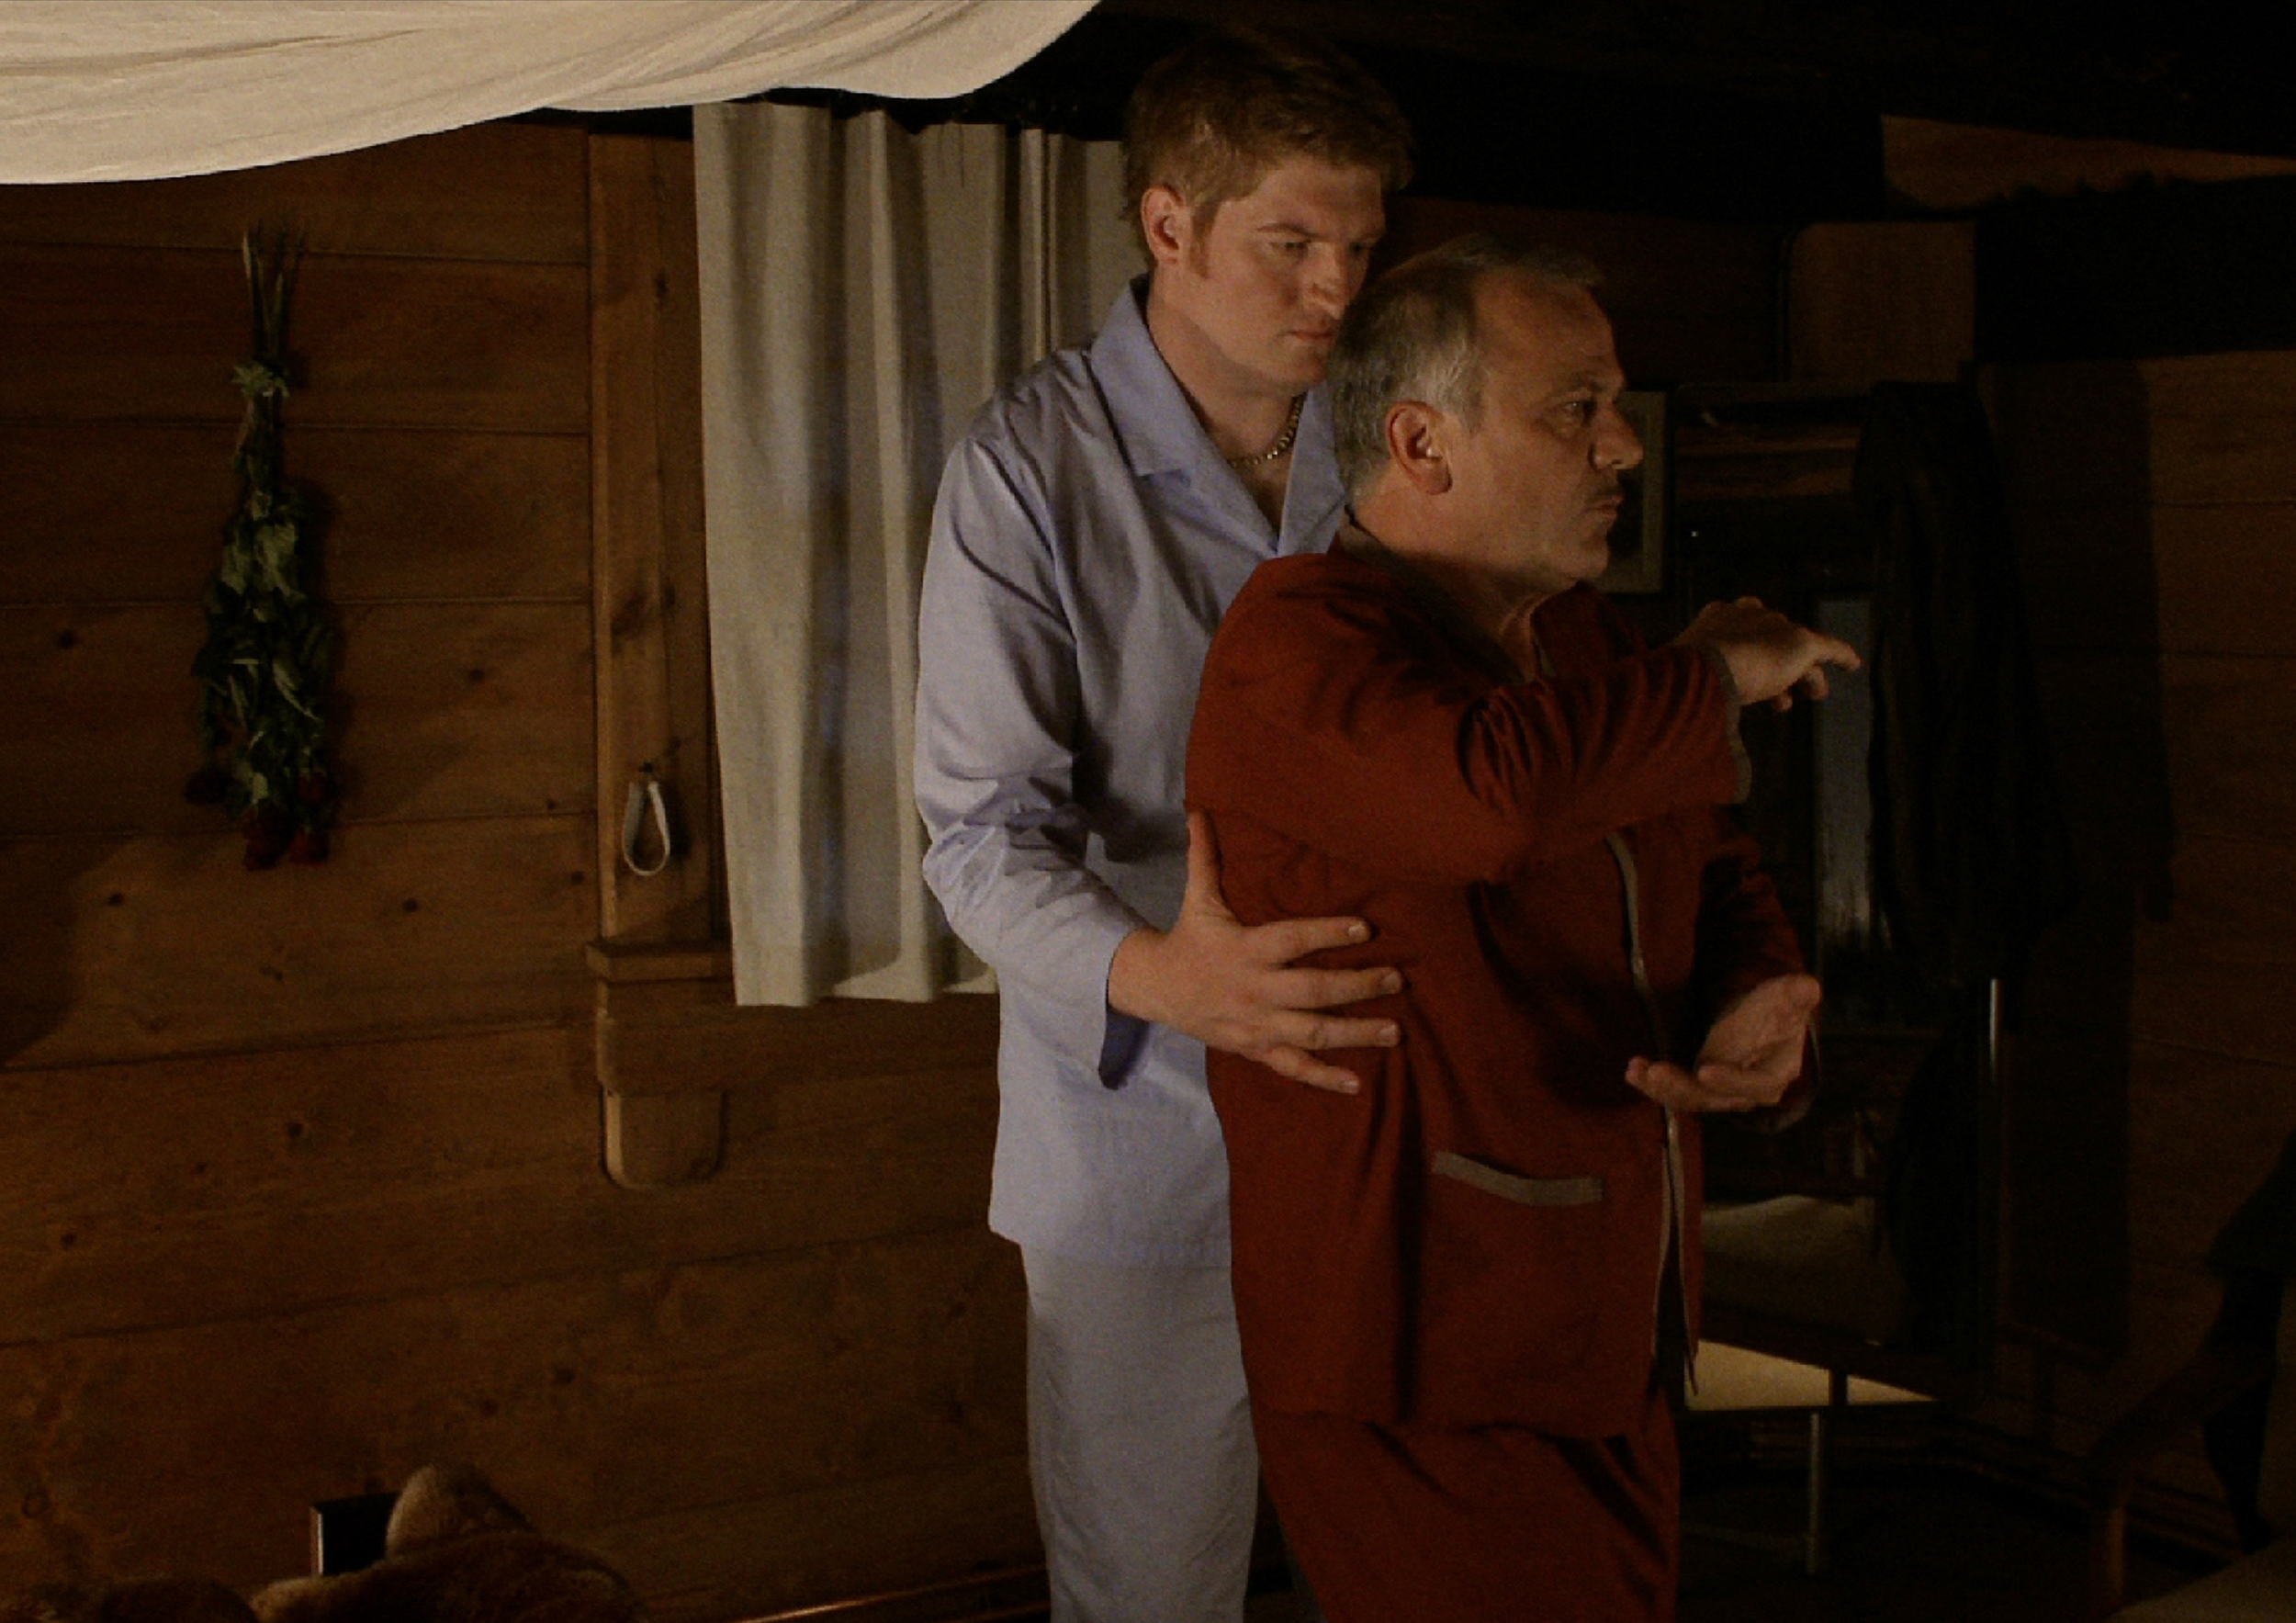 """Sohnemänner"", Regie: Ingo Haeb, Lauterbach 2010"